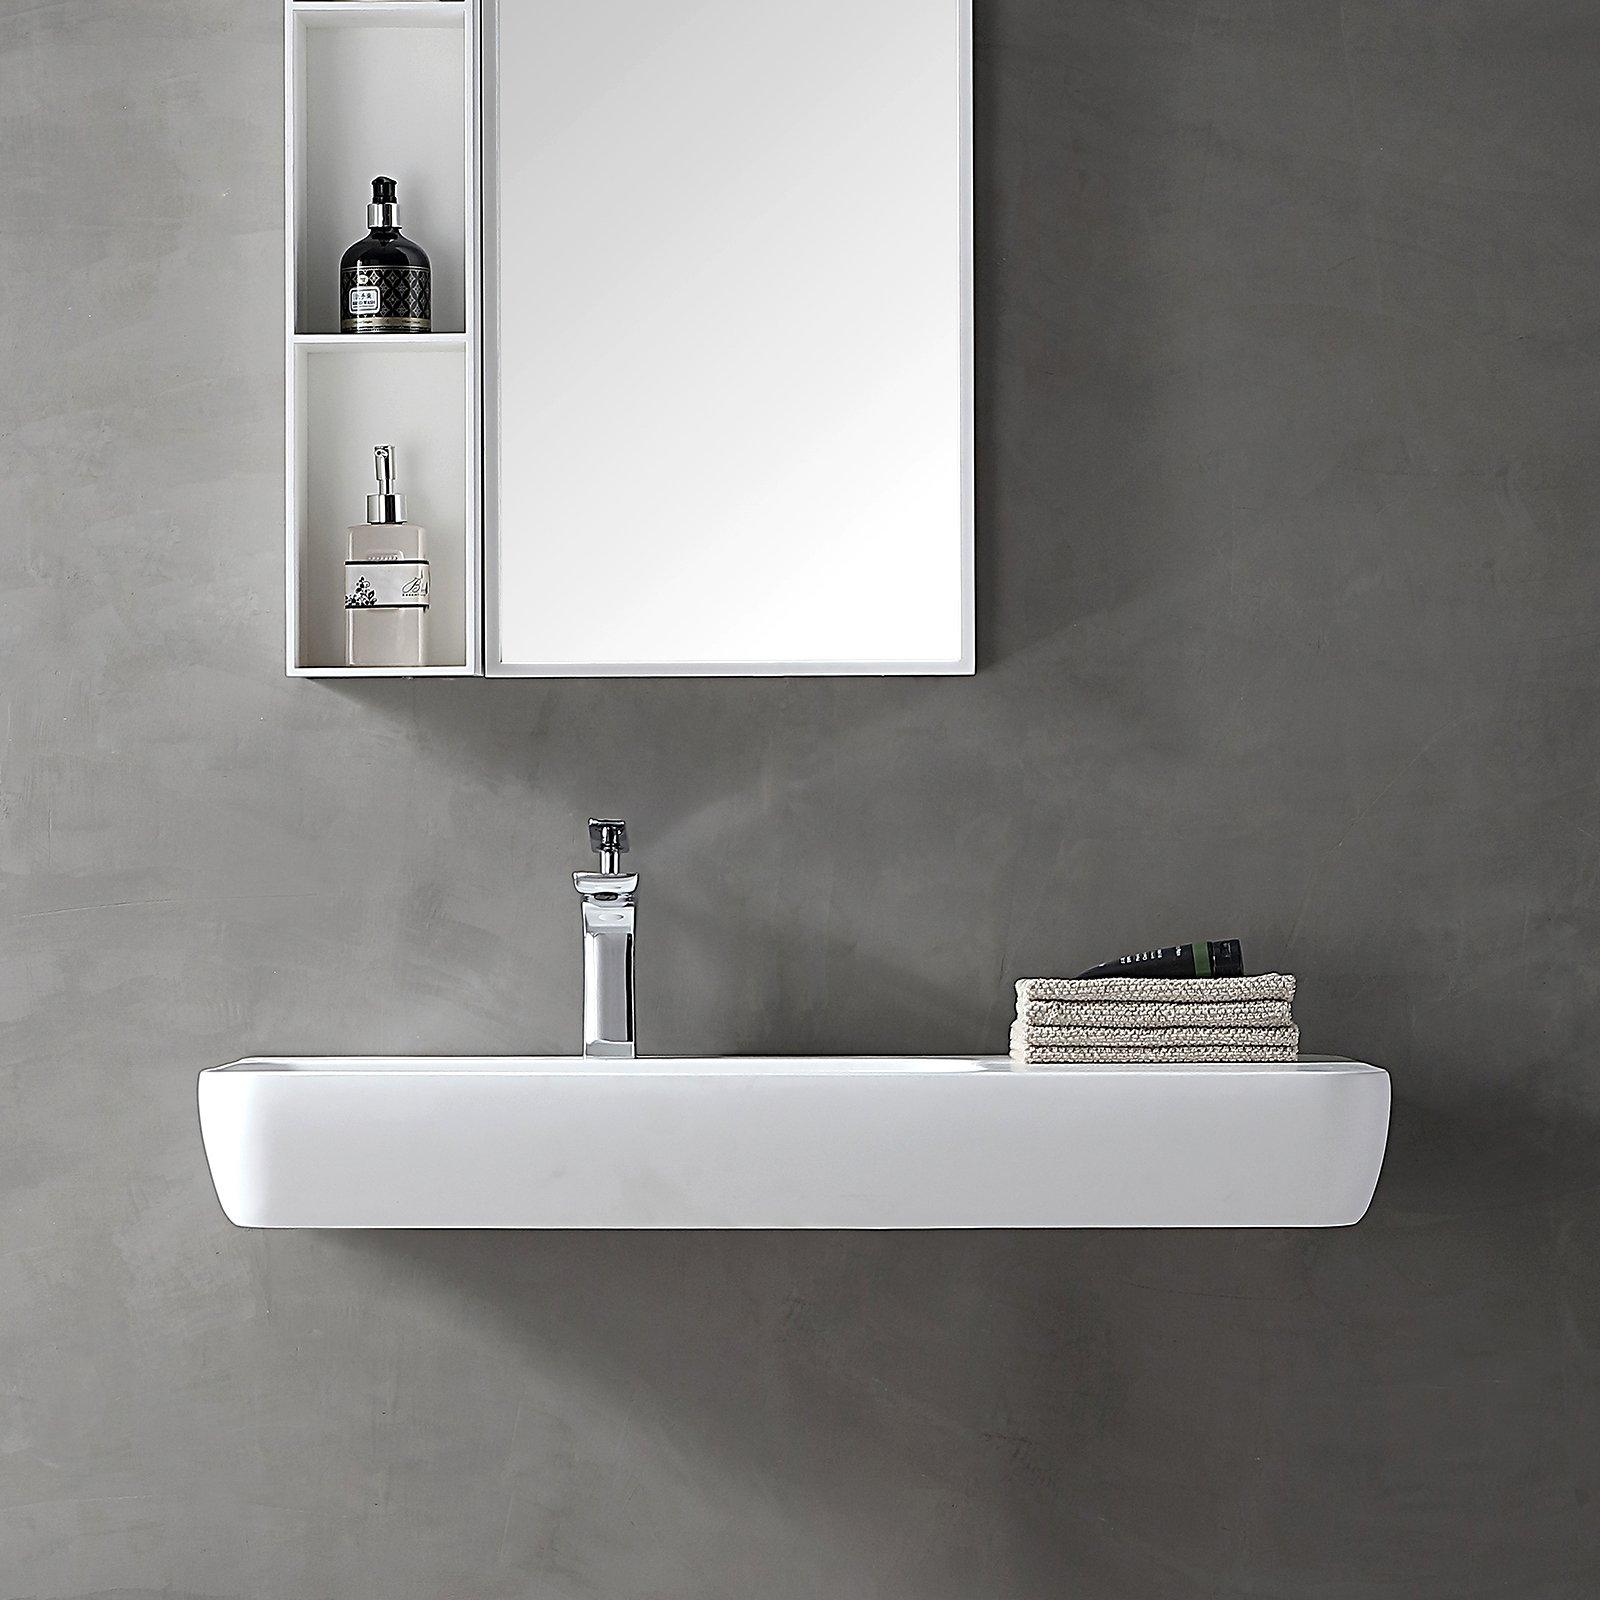 Wandwaschbecken Aufsatzwaschbecken TWG202 aus Mineralguss Solid Stone - Weiß matt - 90x40x12cm zoom thumbnail 4